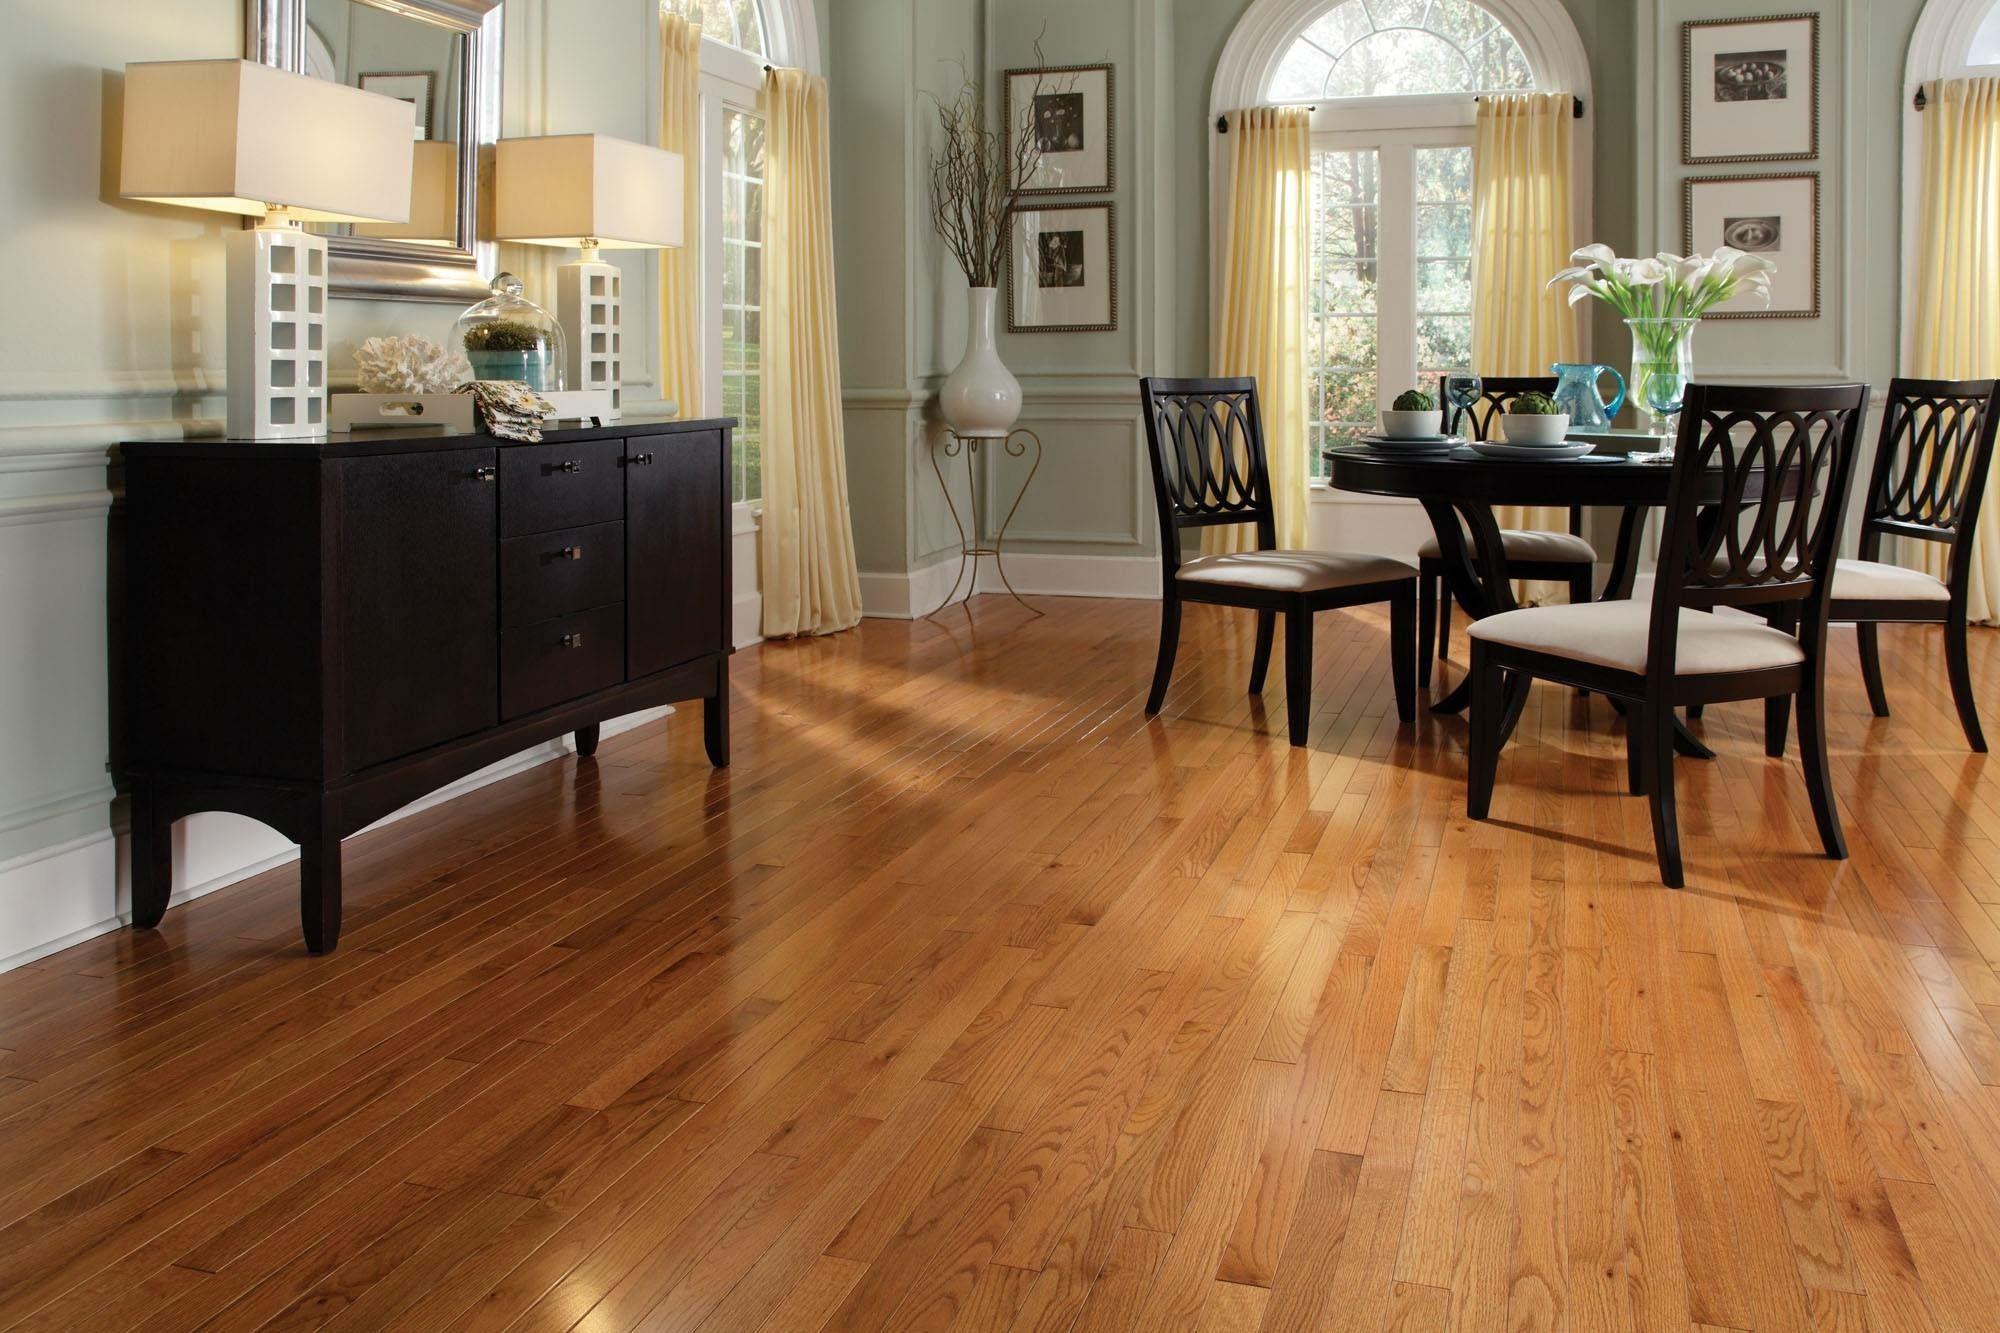 Pin by Deanna Diamond on Homes & Decor Golden oak floors